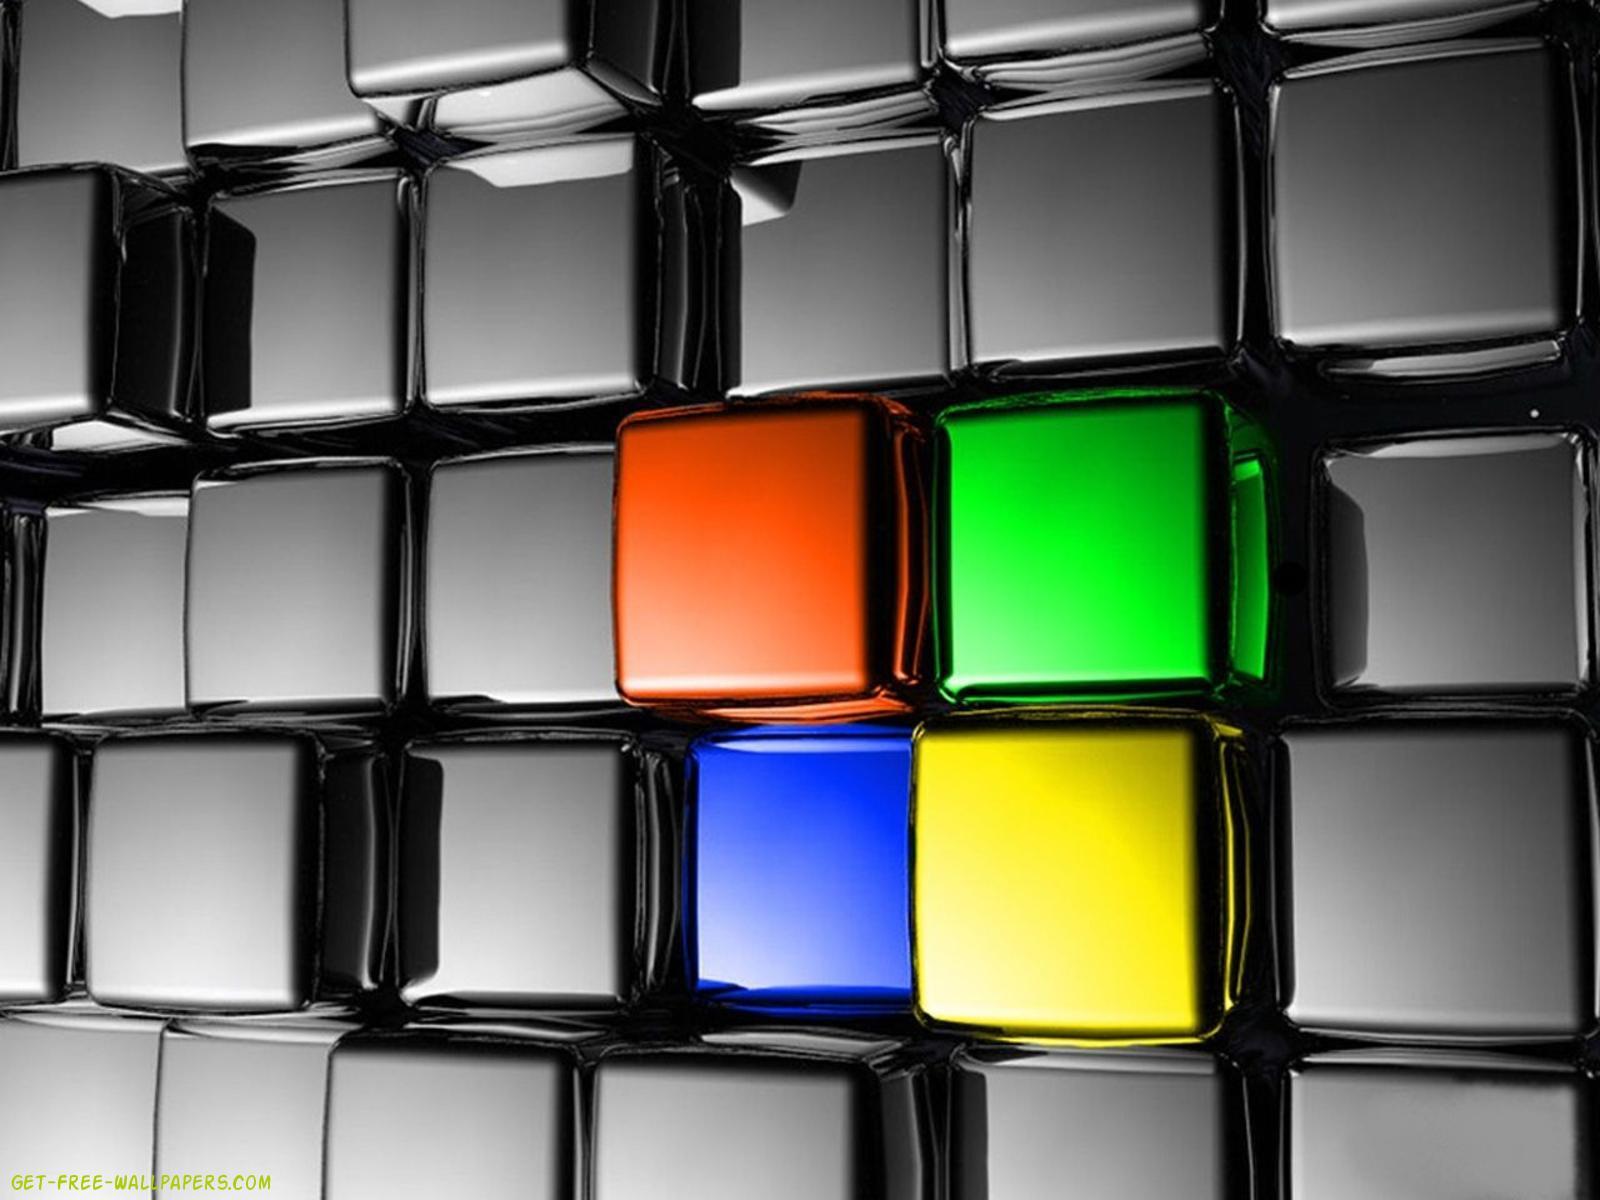 Free Computer Wallpaper Backgrounds For Fall Block Wallpaper For Desktop Pixelstalk Net